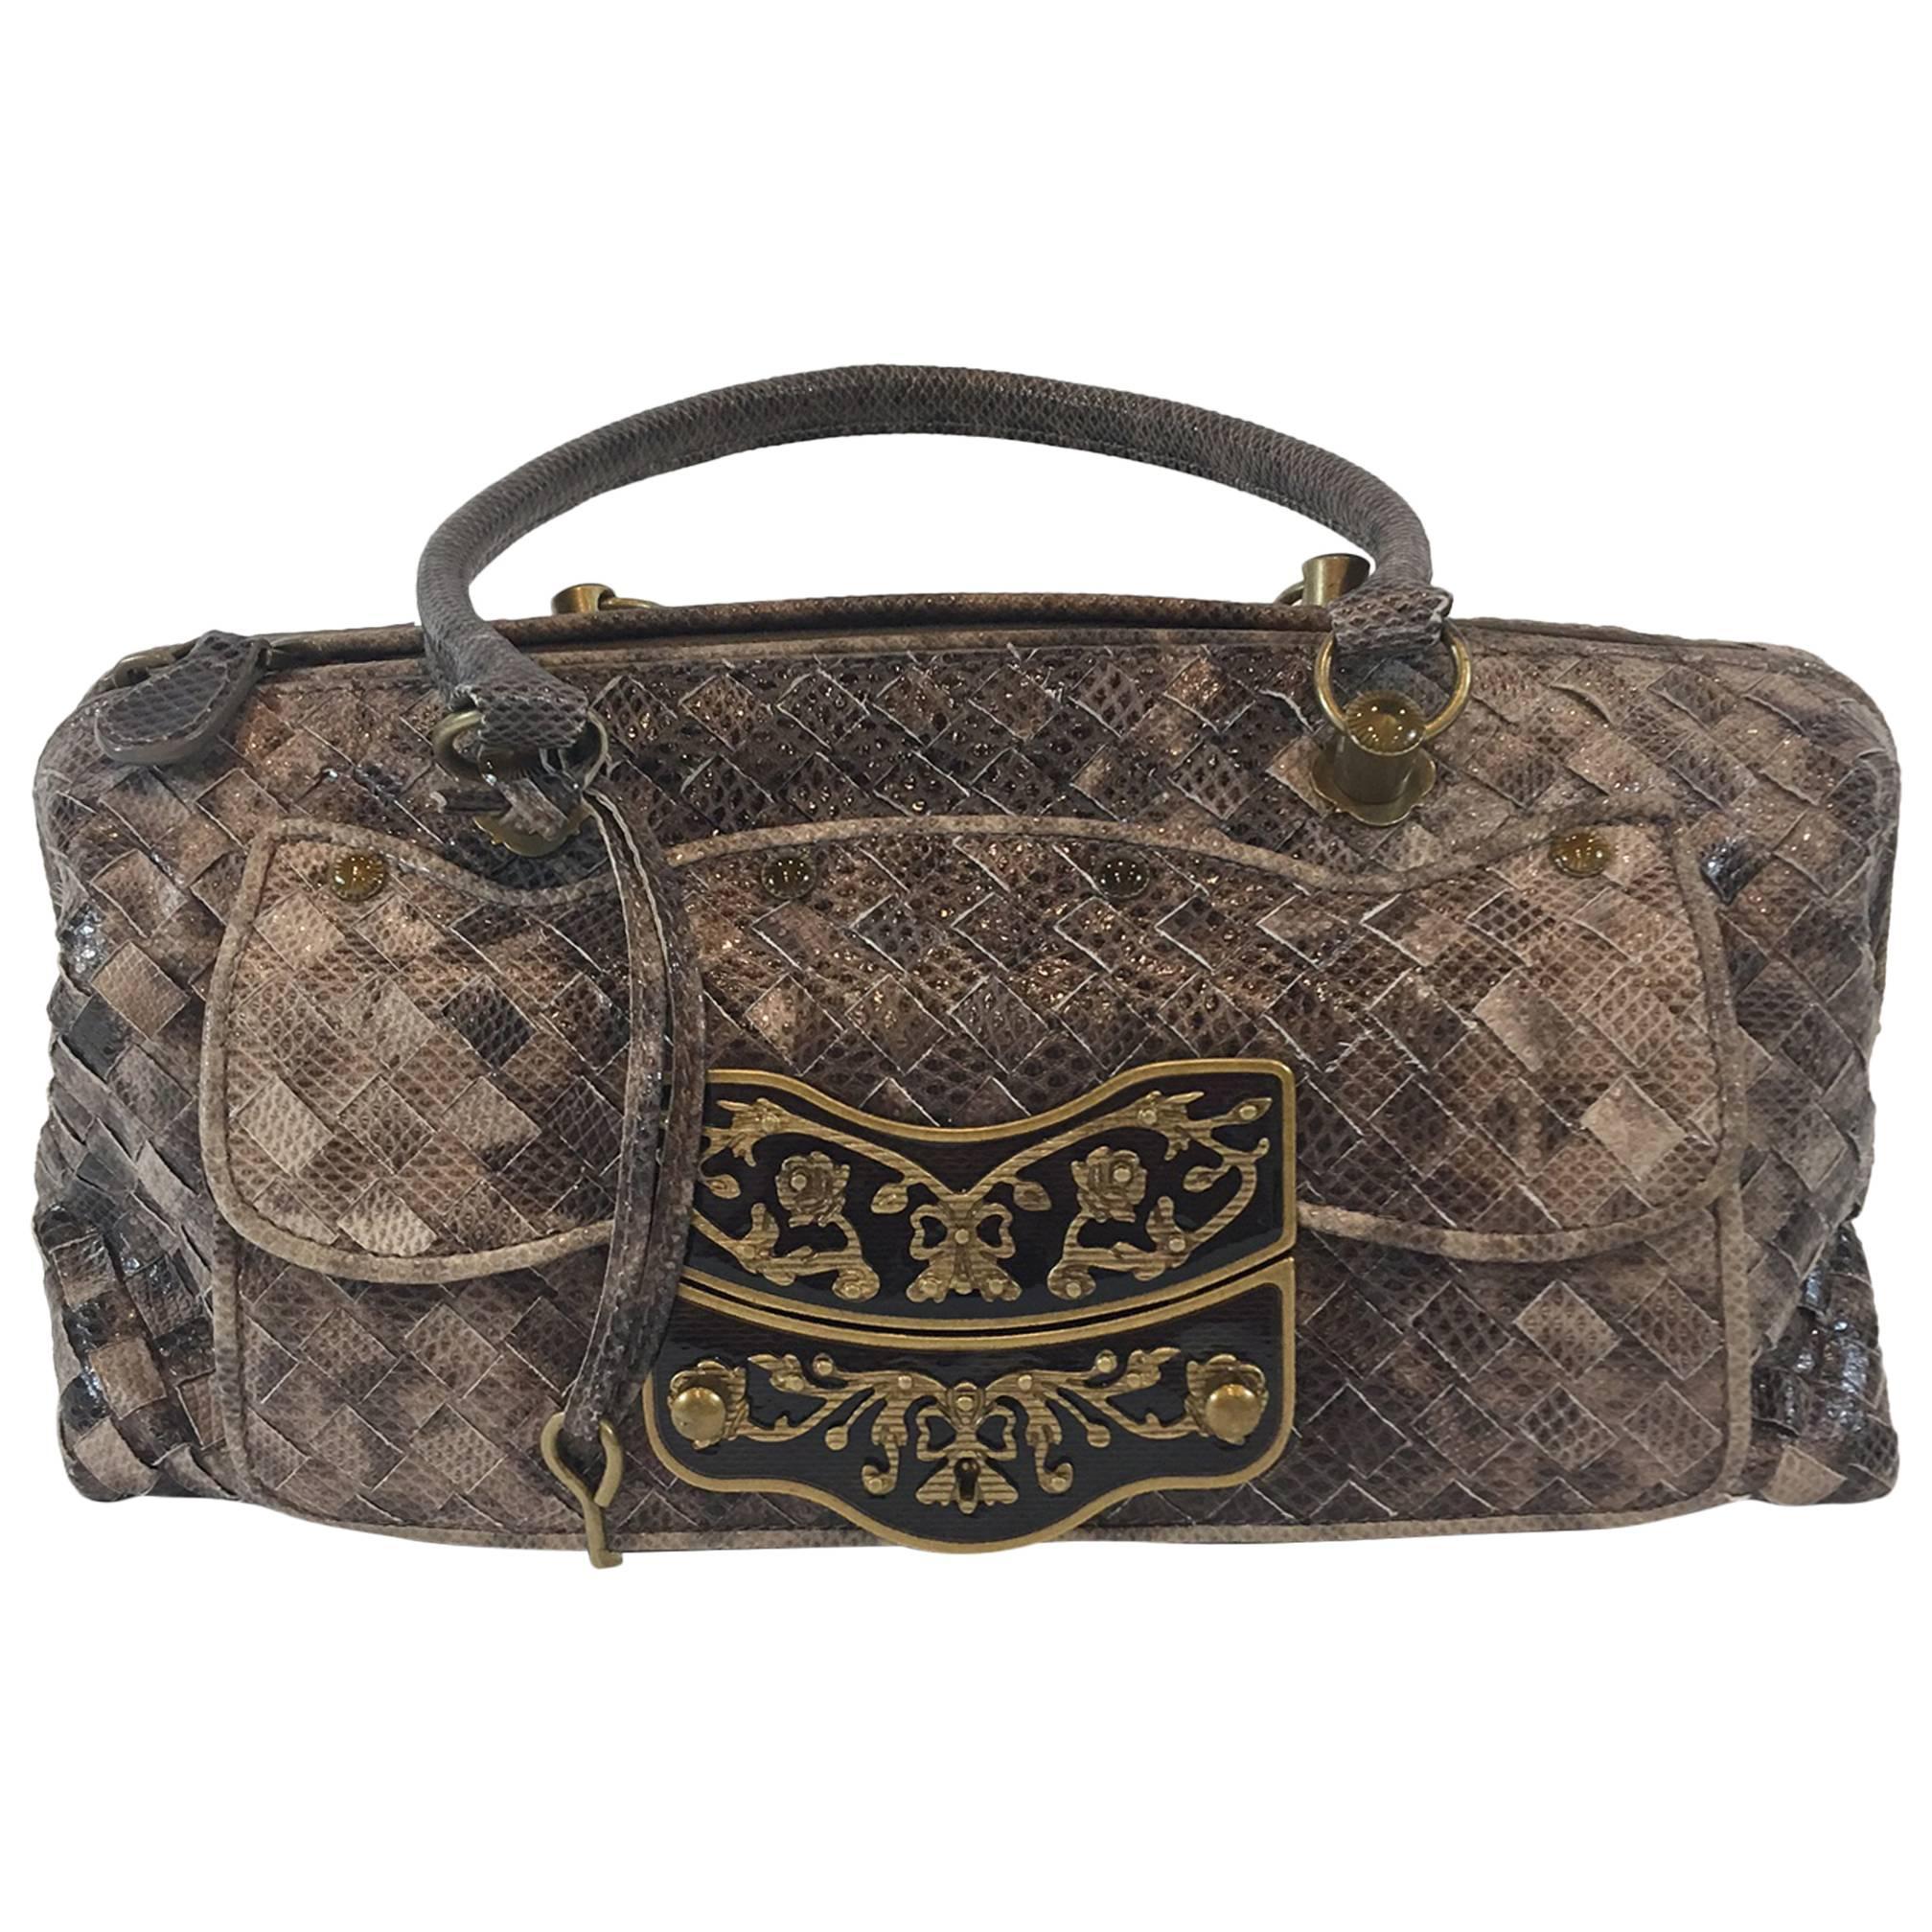 d86274e376 BOTTEGA VENETA bag BRERA SFUMATO ombre black blue super soft MINT at 1stdibs